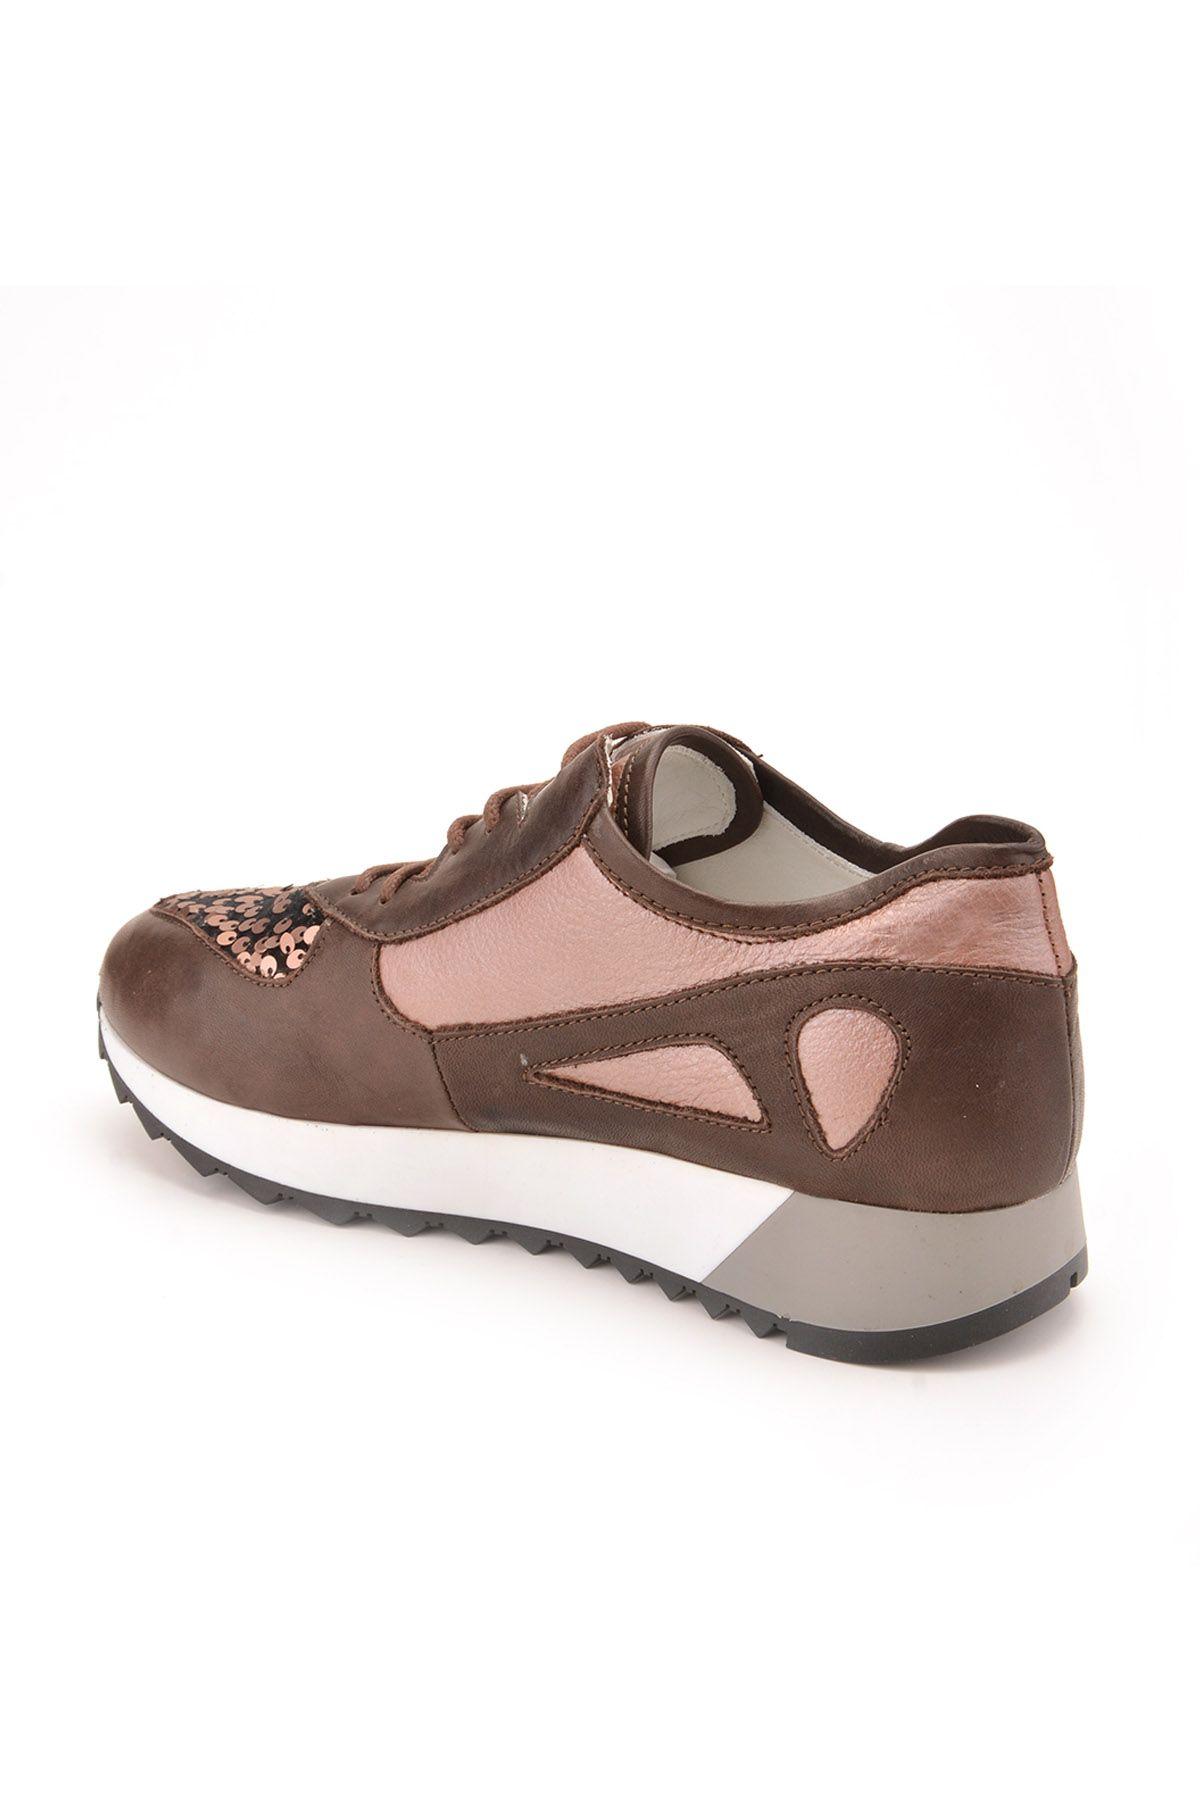 Pegia Anvers Hakiki Deri Bayan Spor Ayakkabı REC-013 Kahve